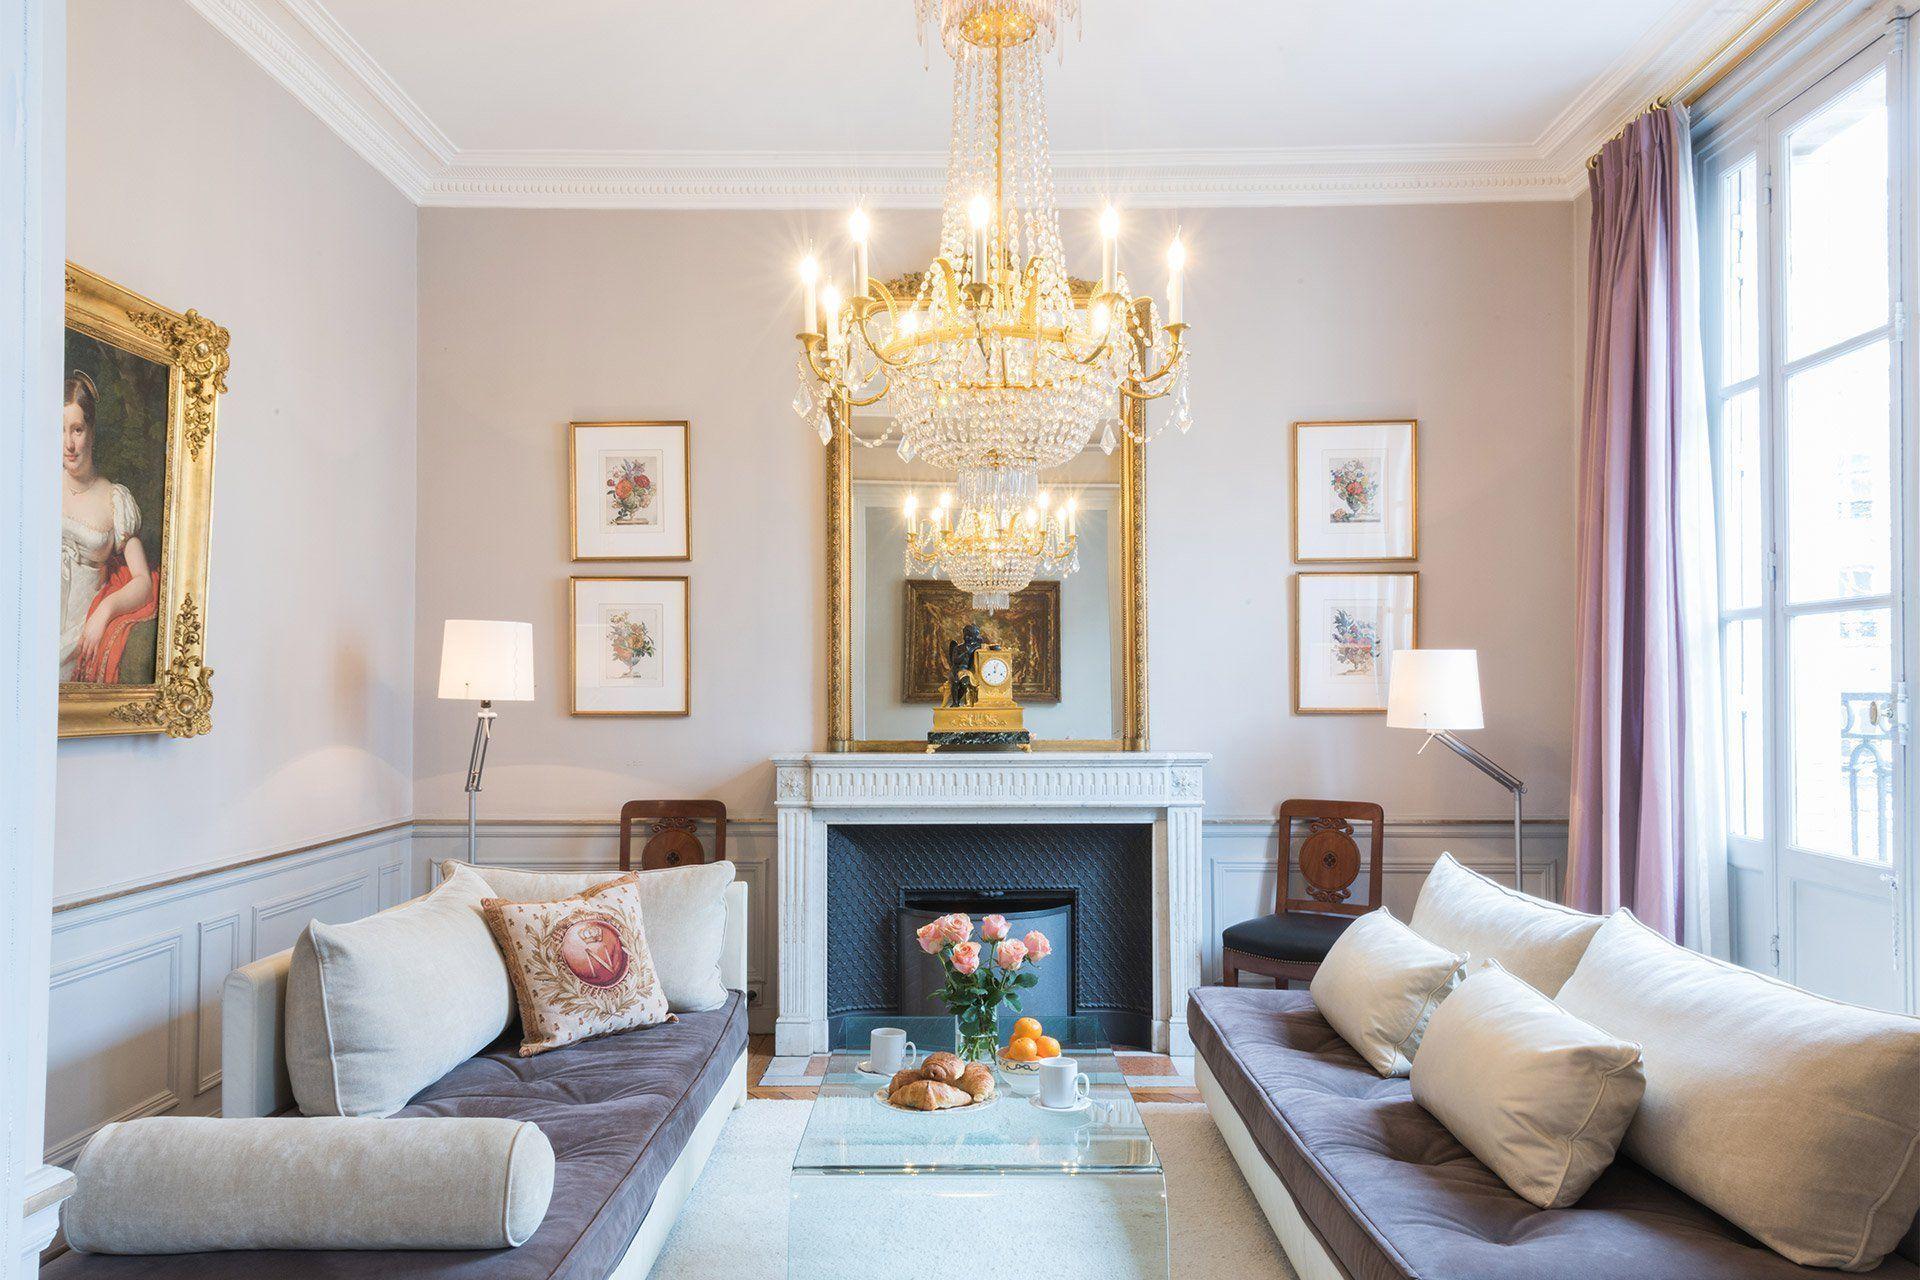 Find 3 Bedroom Luxury Vacation Apartment Rental In Paris